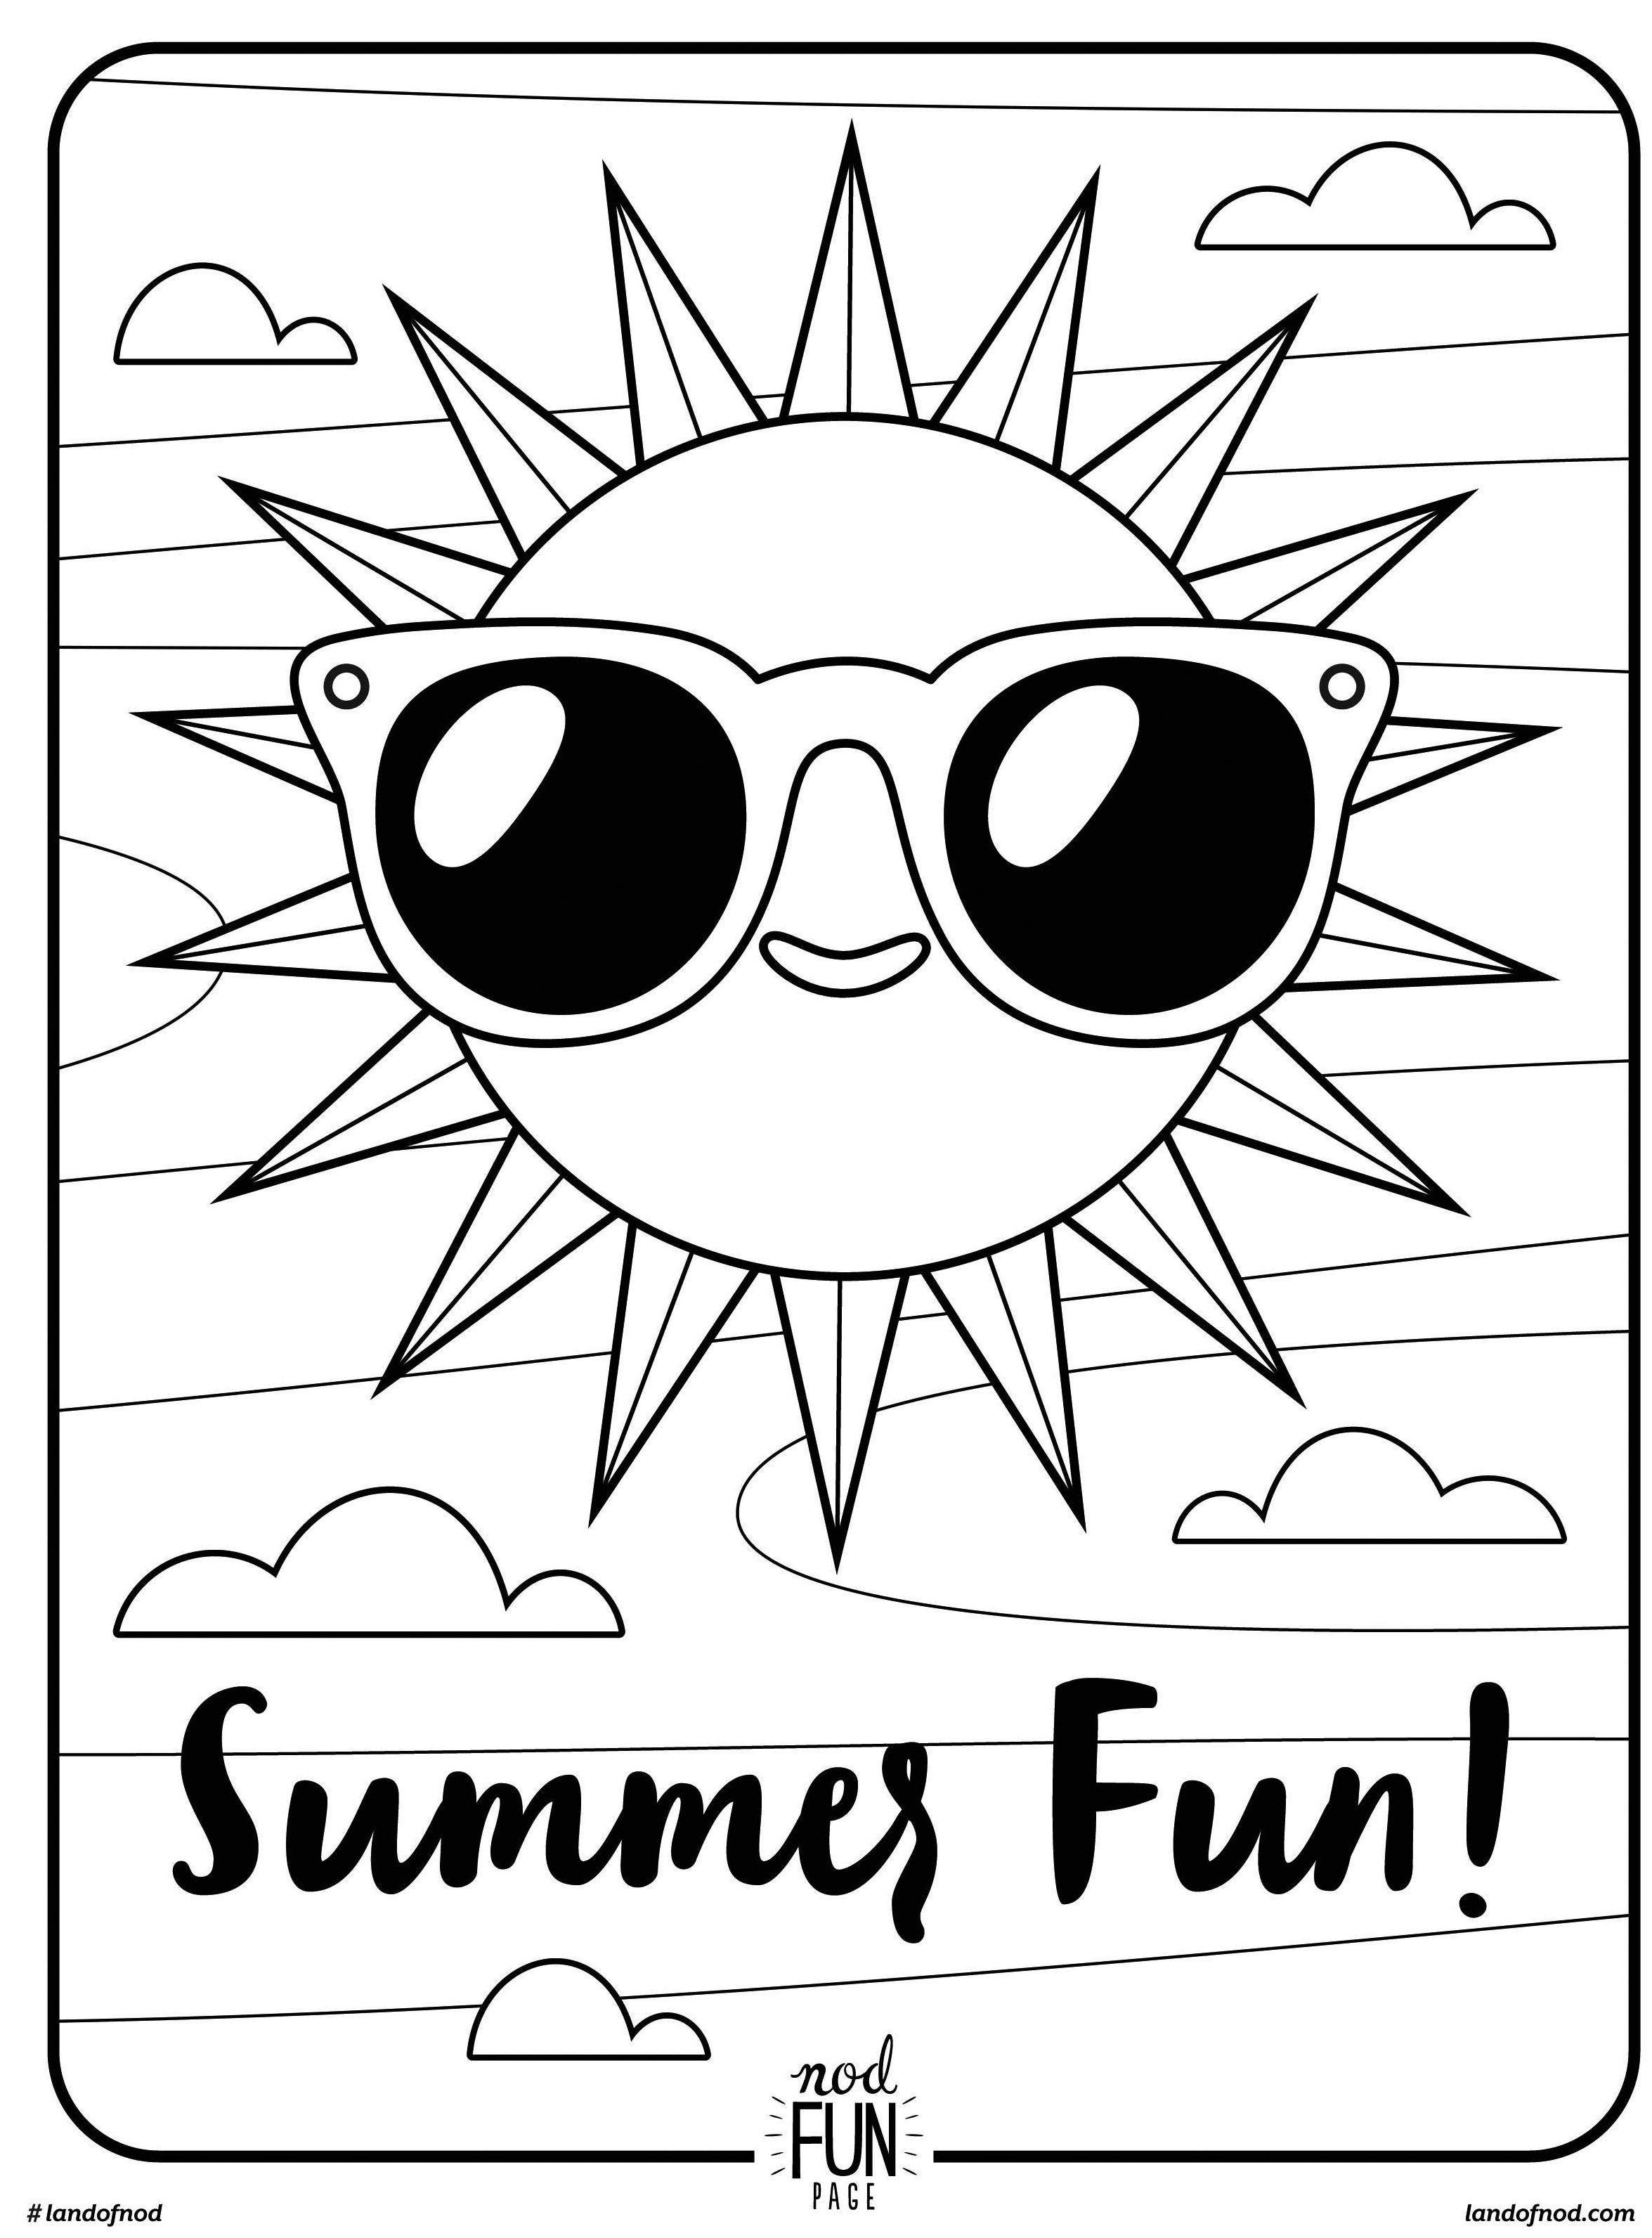 Free Printable Coloring Page: Summer Fun | Summer | Summer Coloring - Summer Coloring Sheets Free Printable